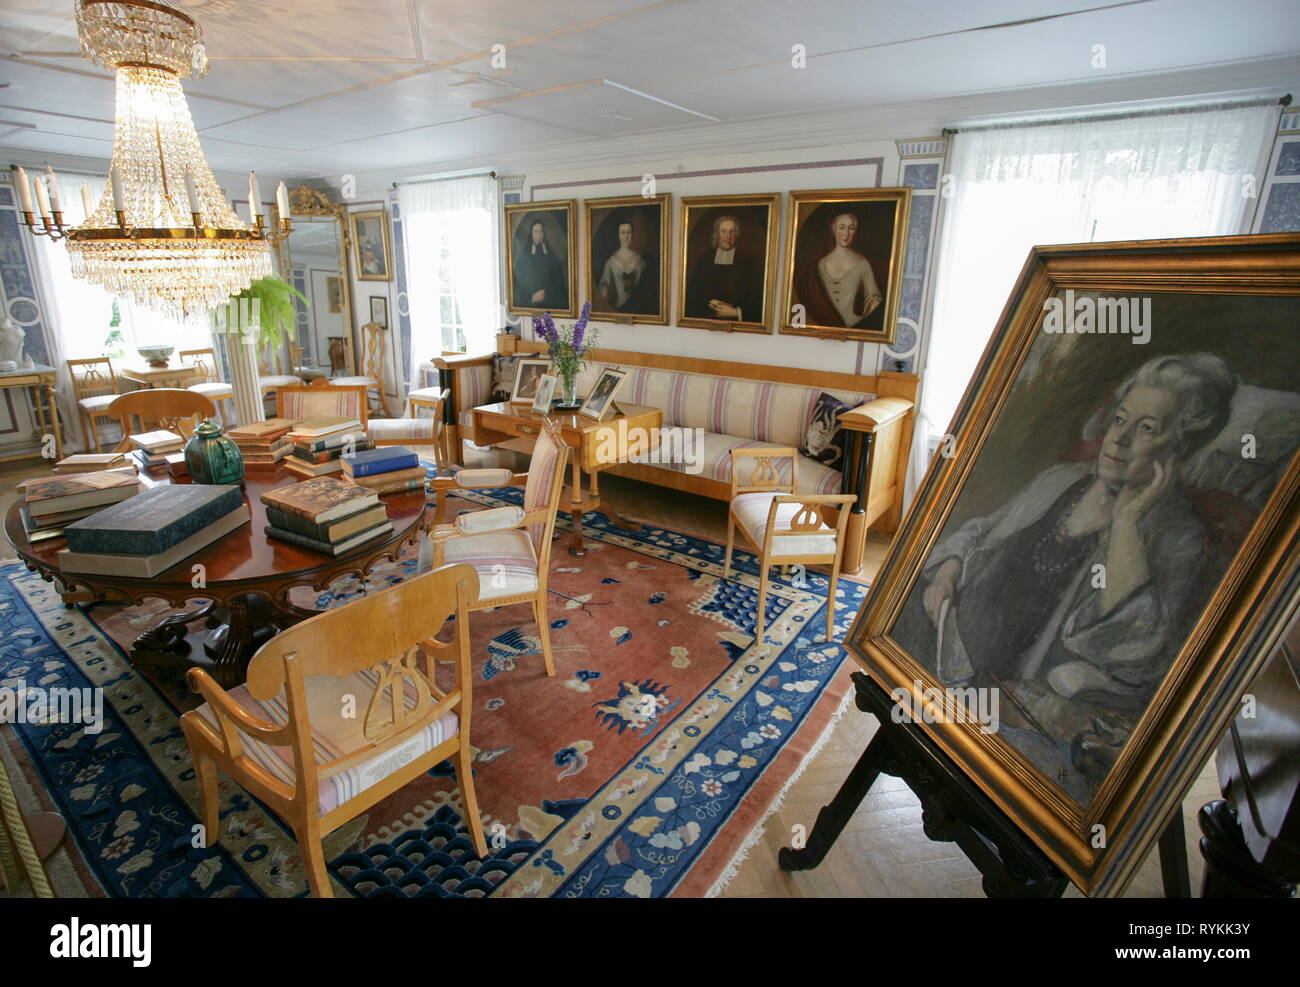 La Maison De La Suede maison de selma lagerlof a marbacka suede stock photo